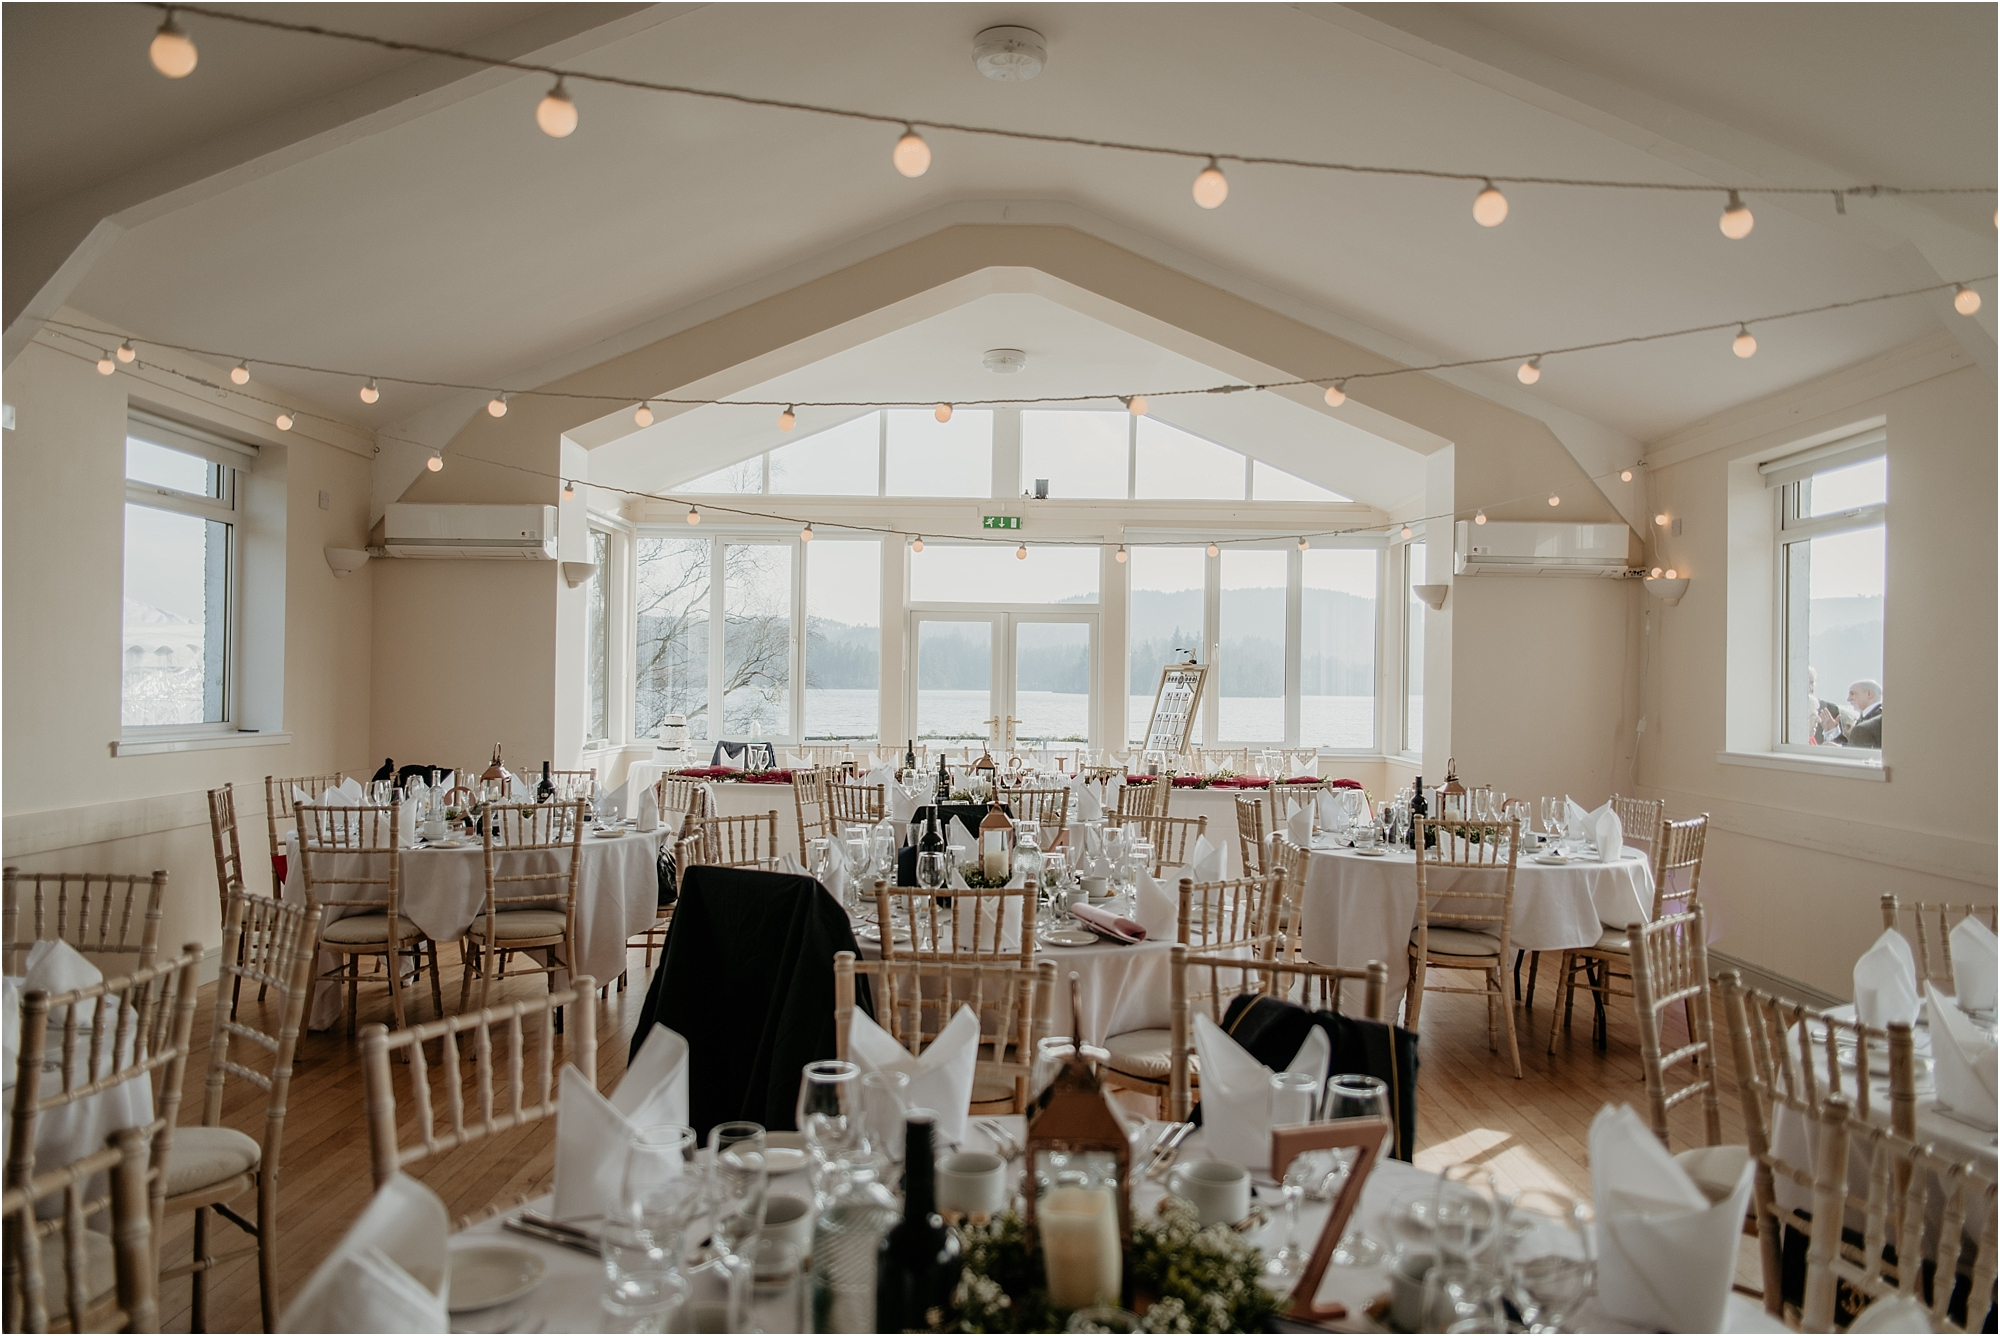 Kinlochard-village-hall-scottish-wedding-claire-fleck-photography__0070.jpg